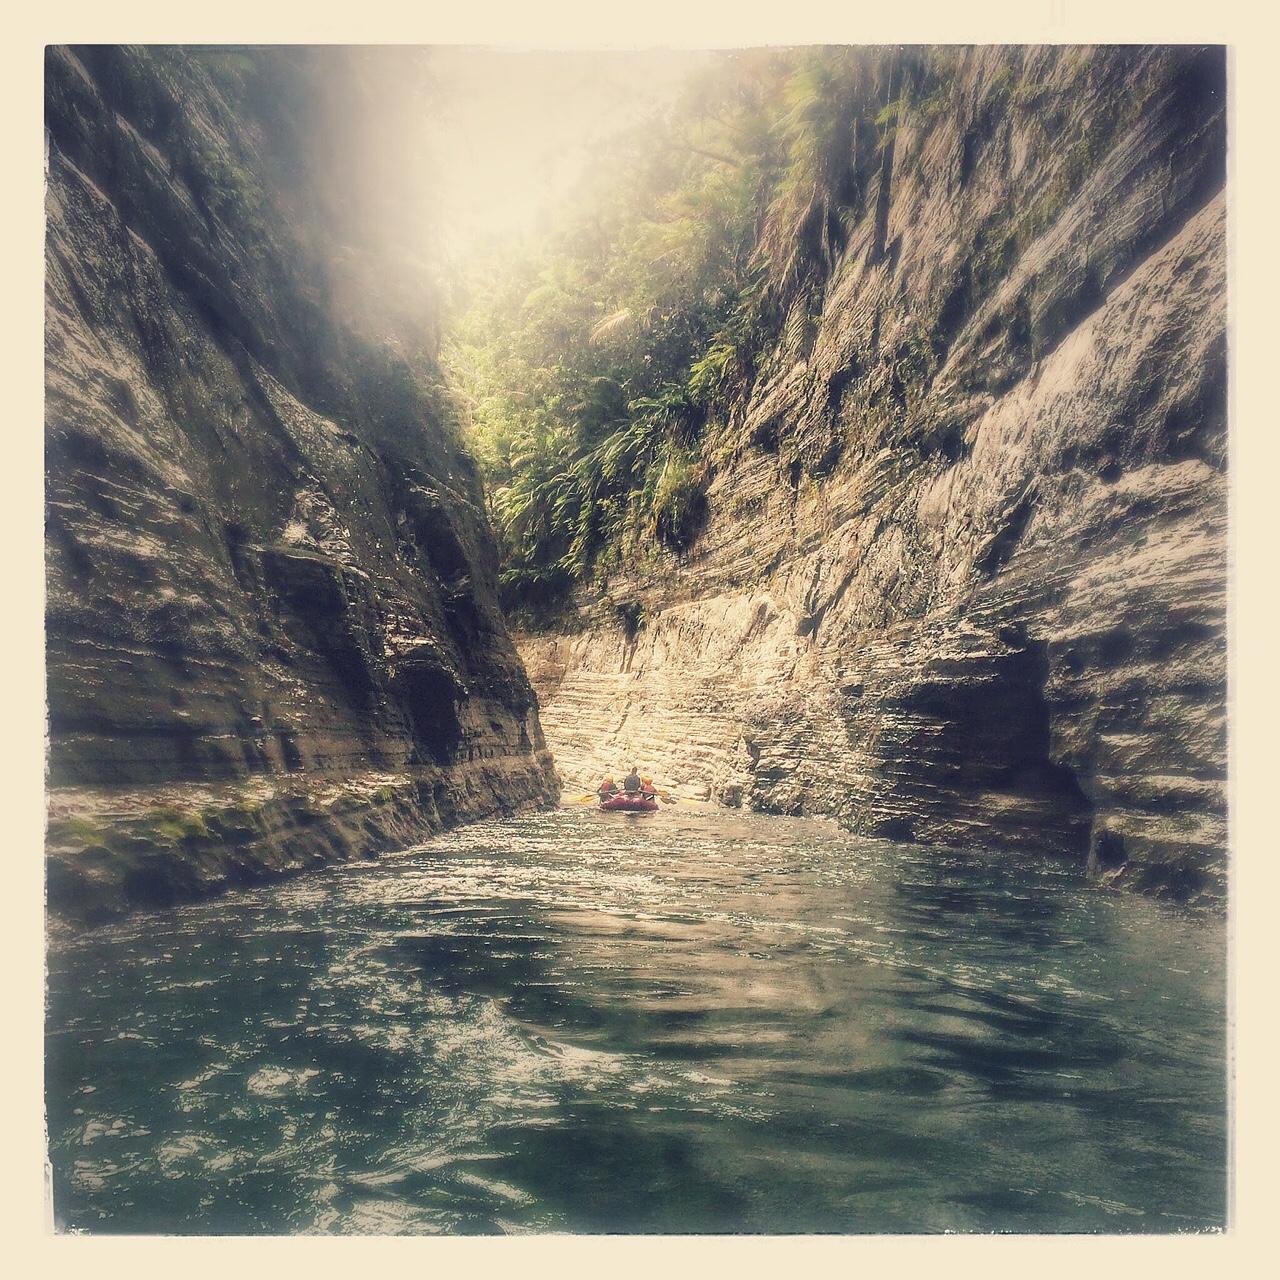 Navua River gorges